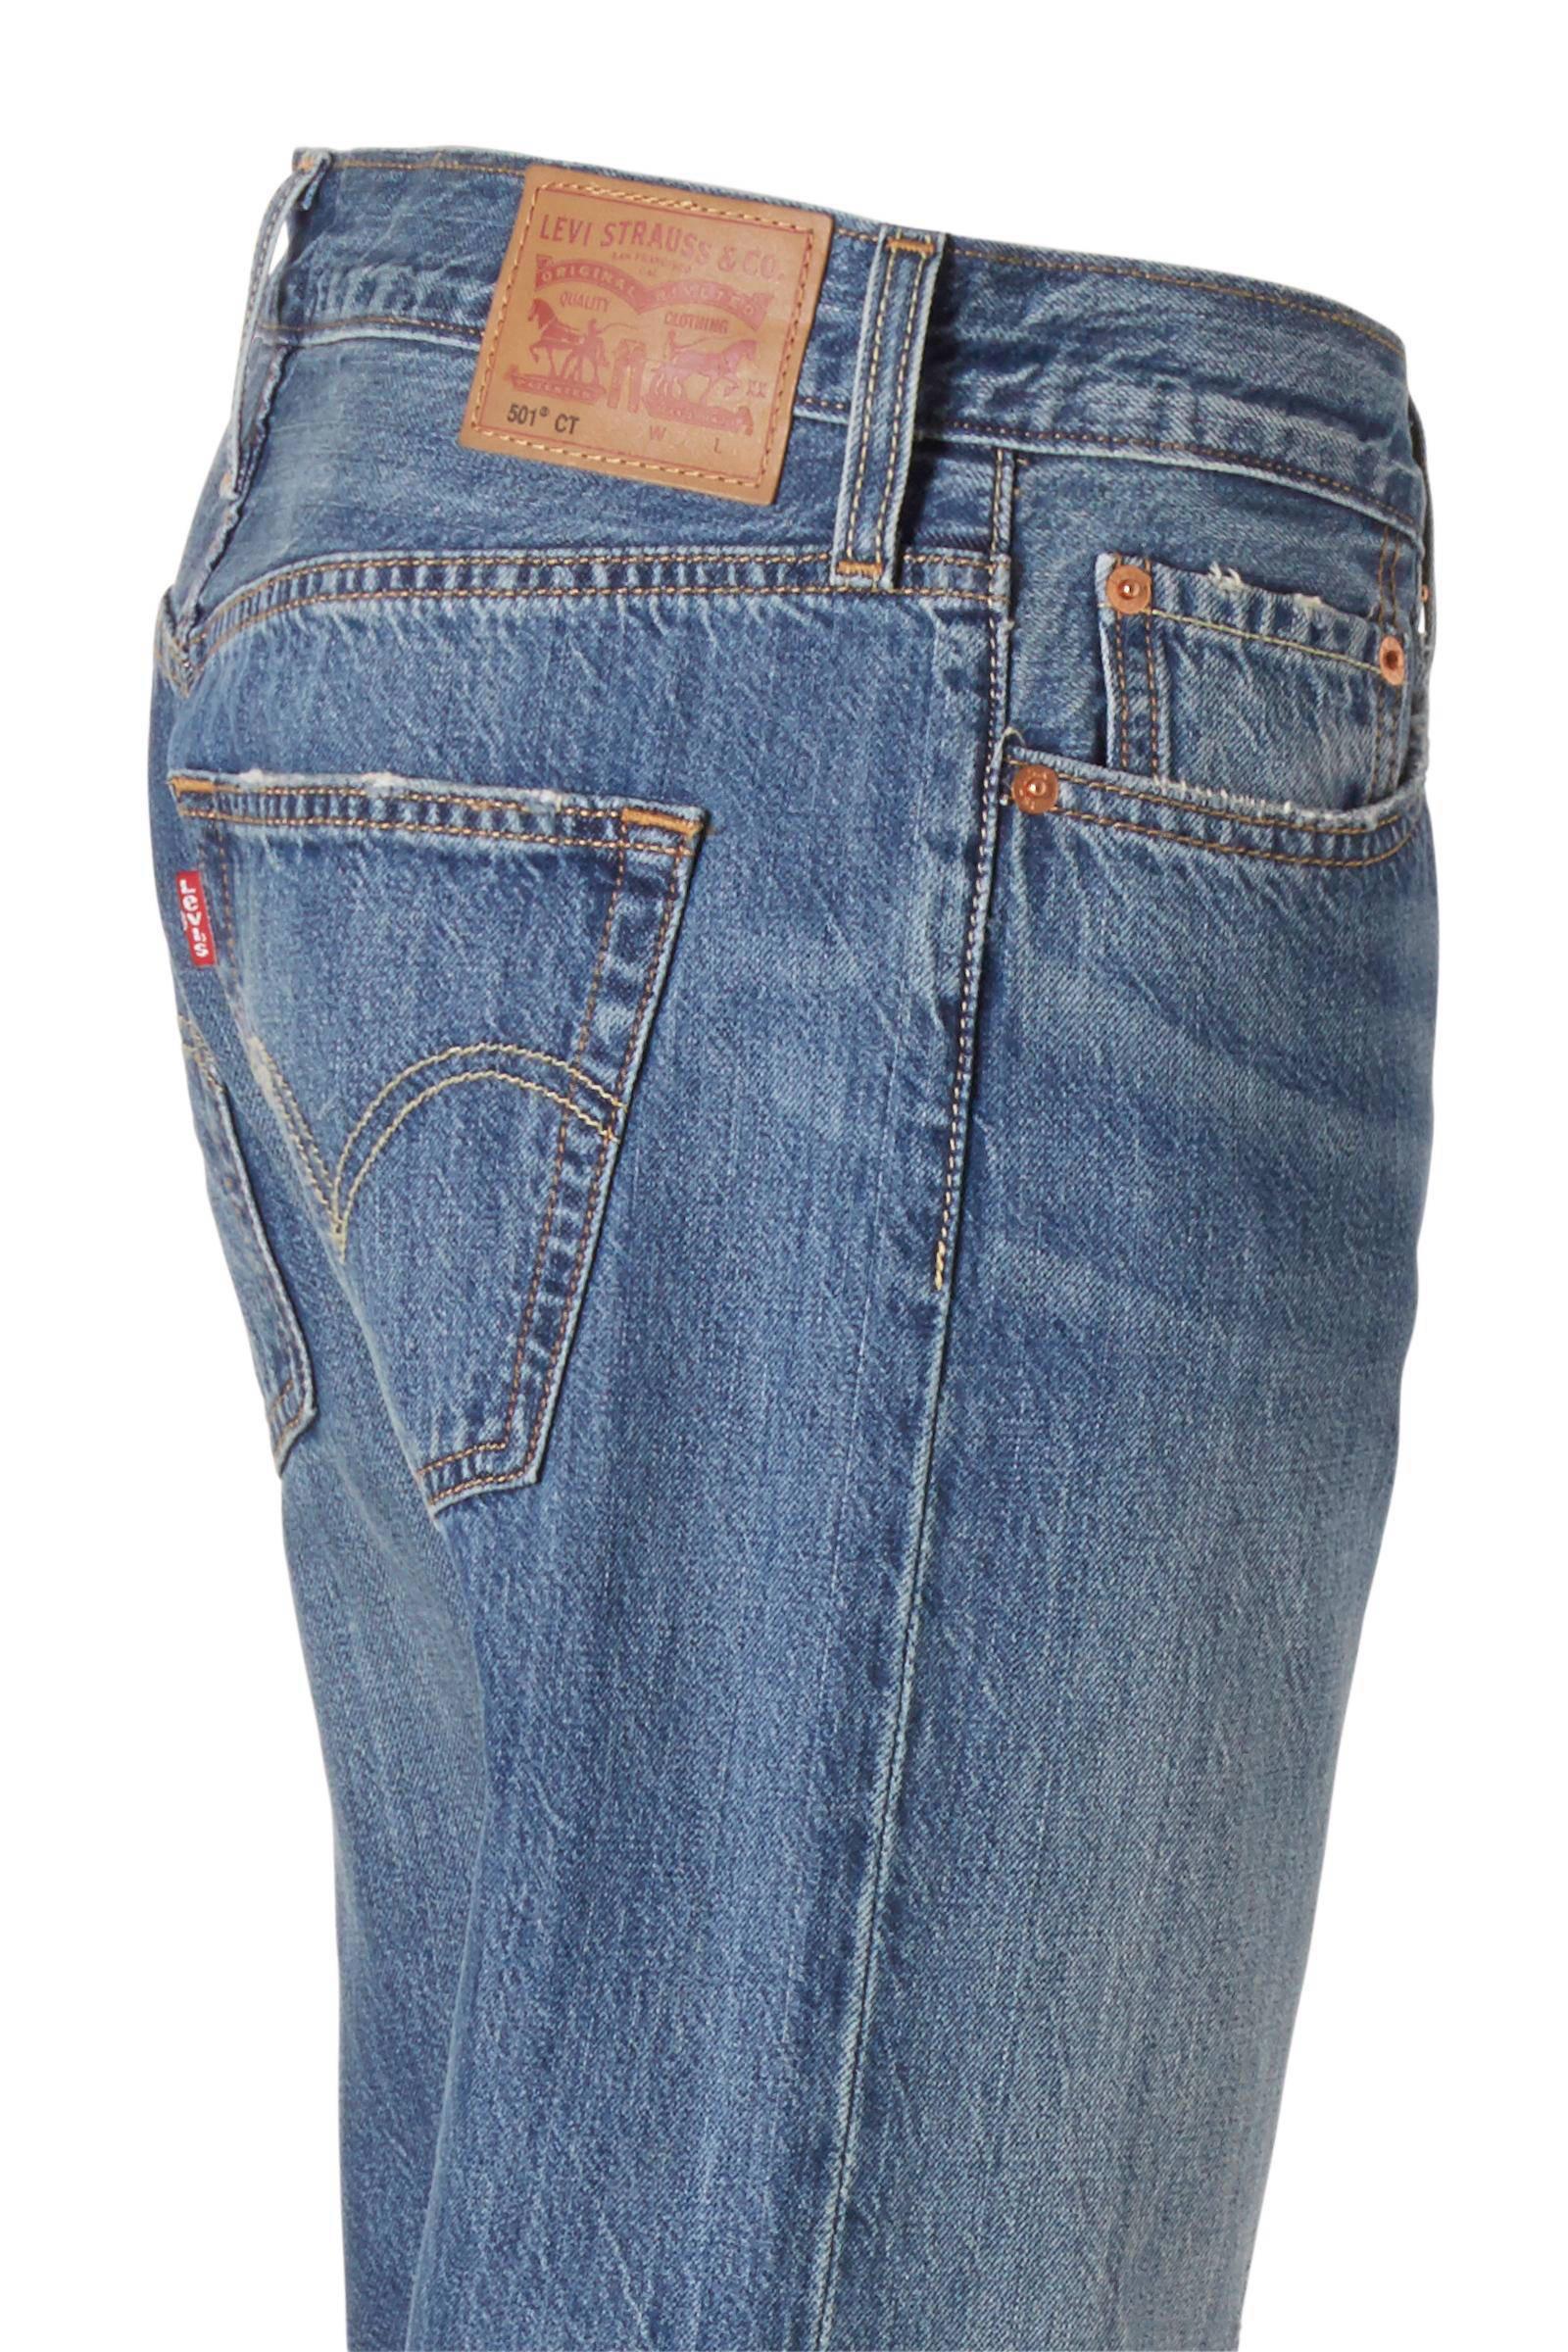 on sale fe111 ed799 levis-501-ct-jeans-dames-dark-denim.jpg